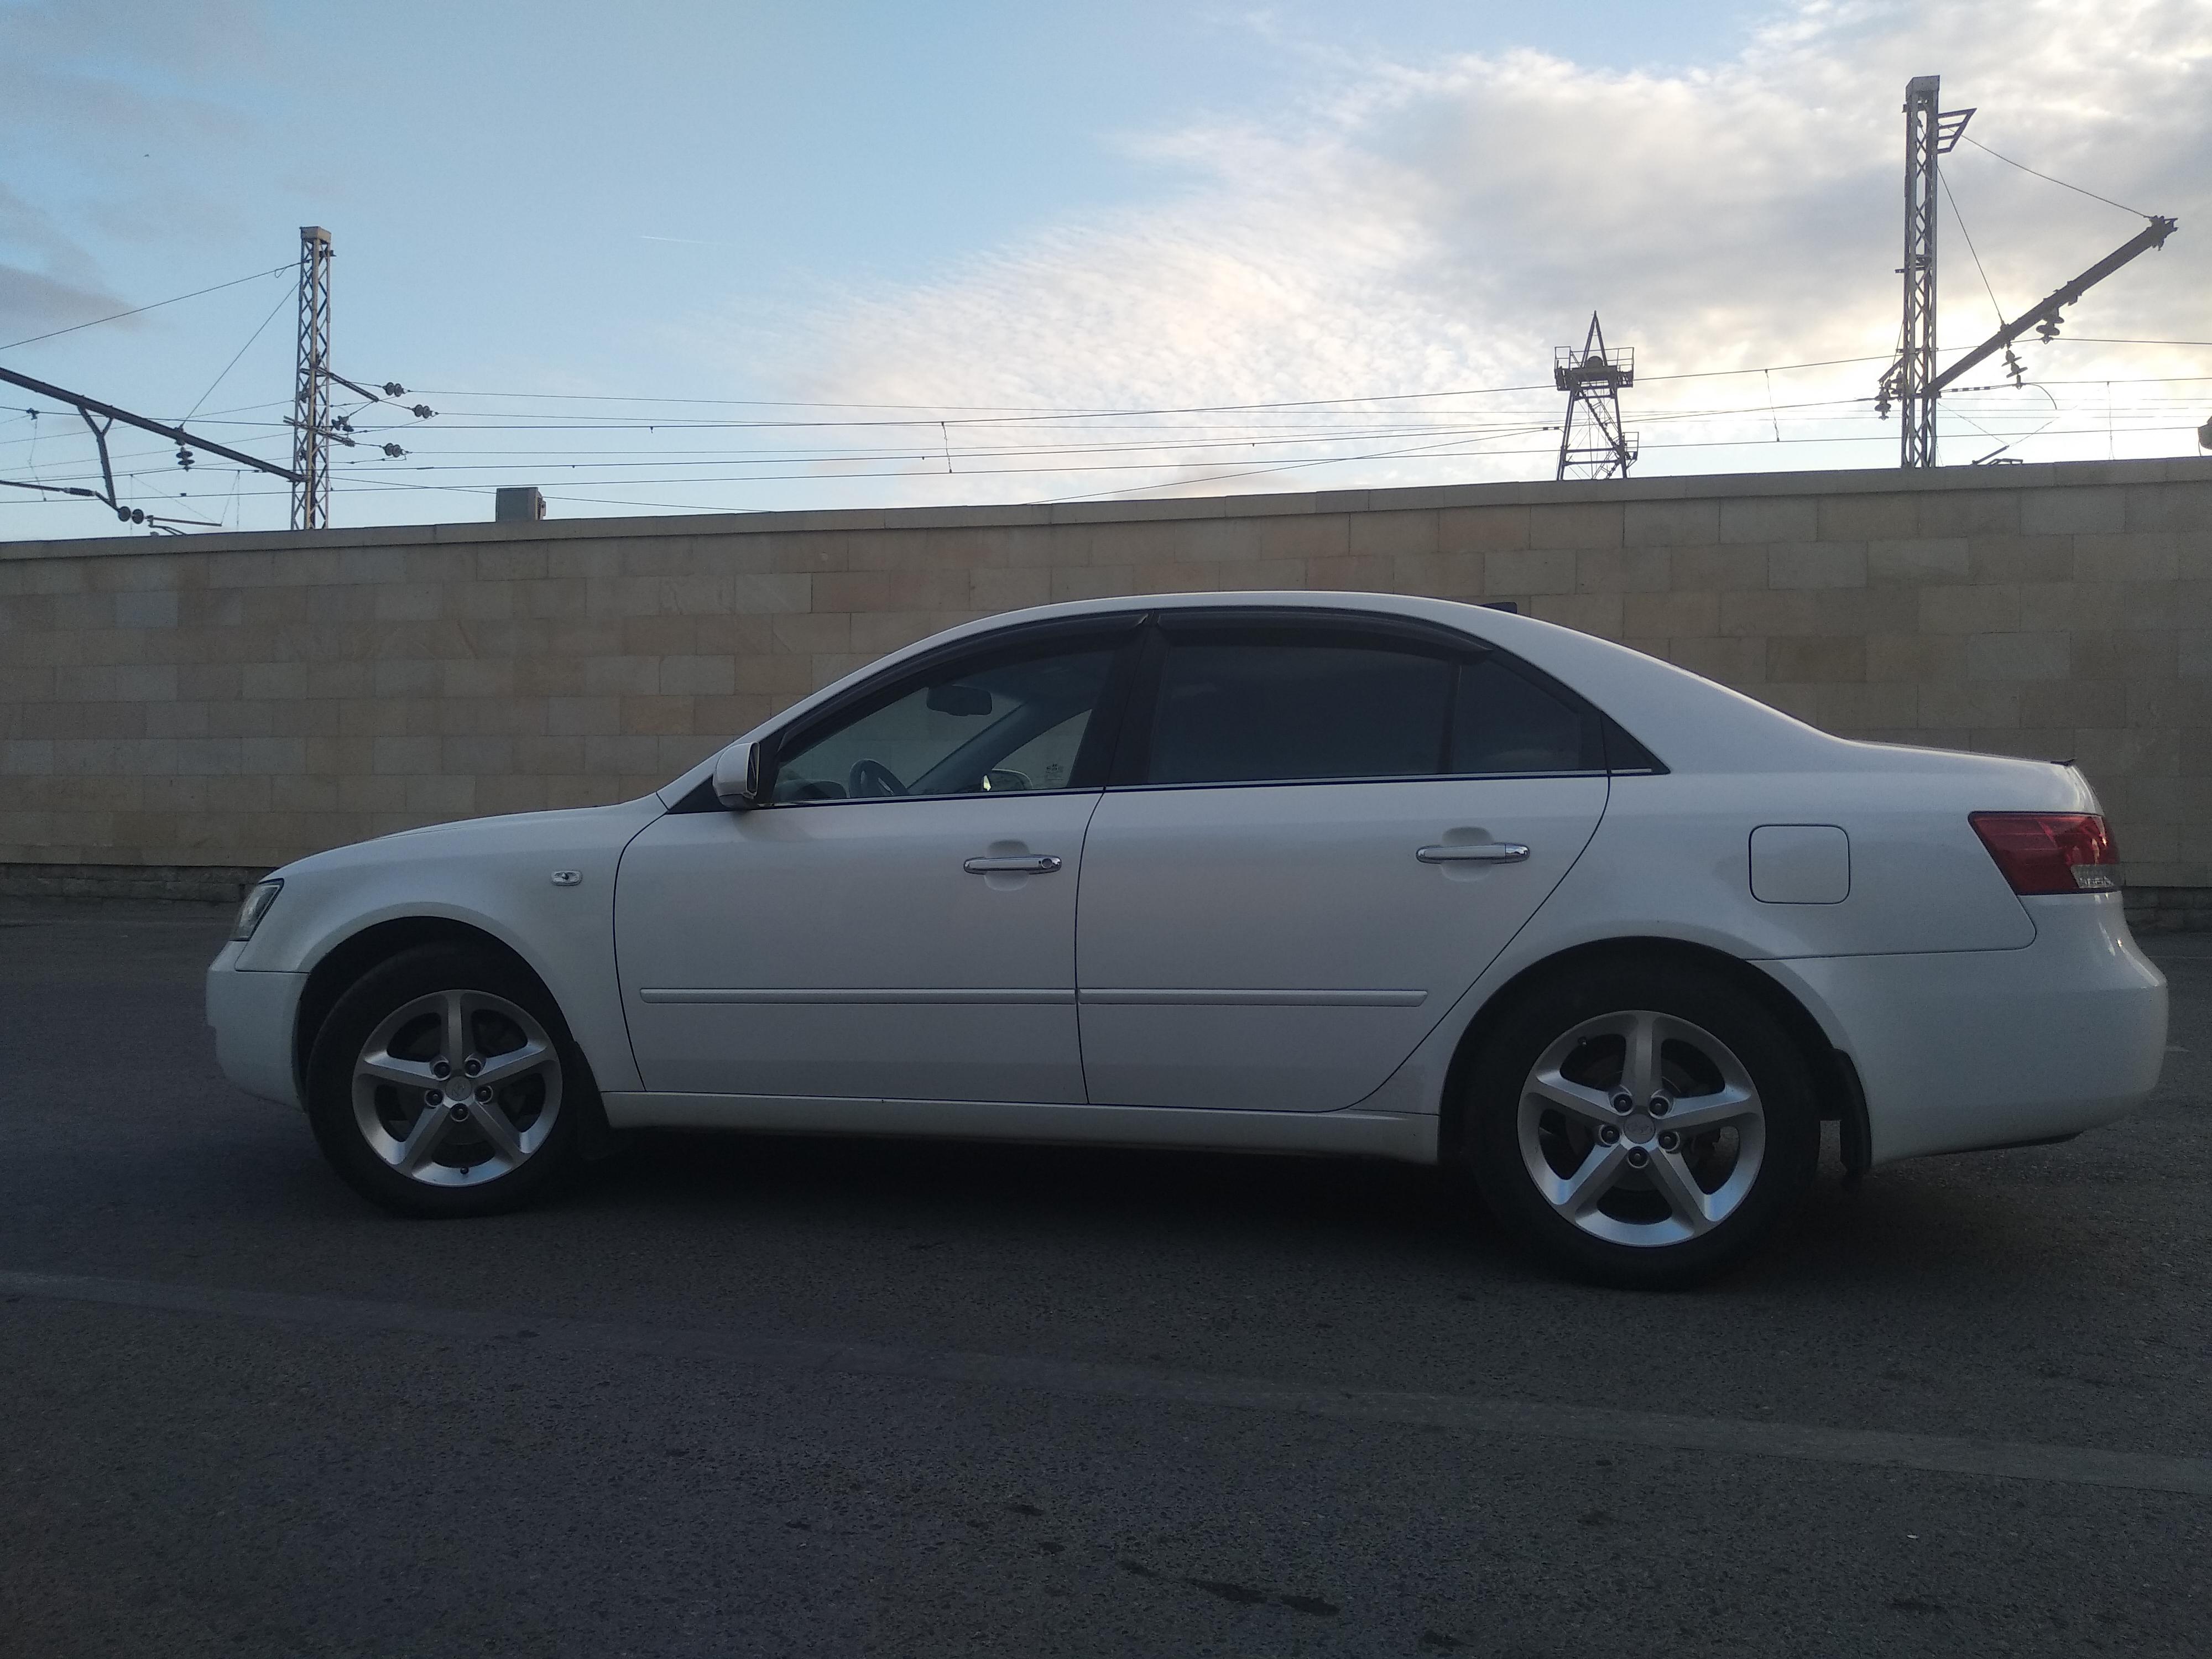 Hyundai Sonata 2.4(lt) 2007 Подержанный  $14100